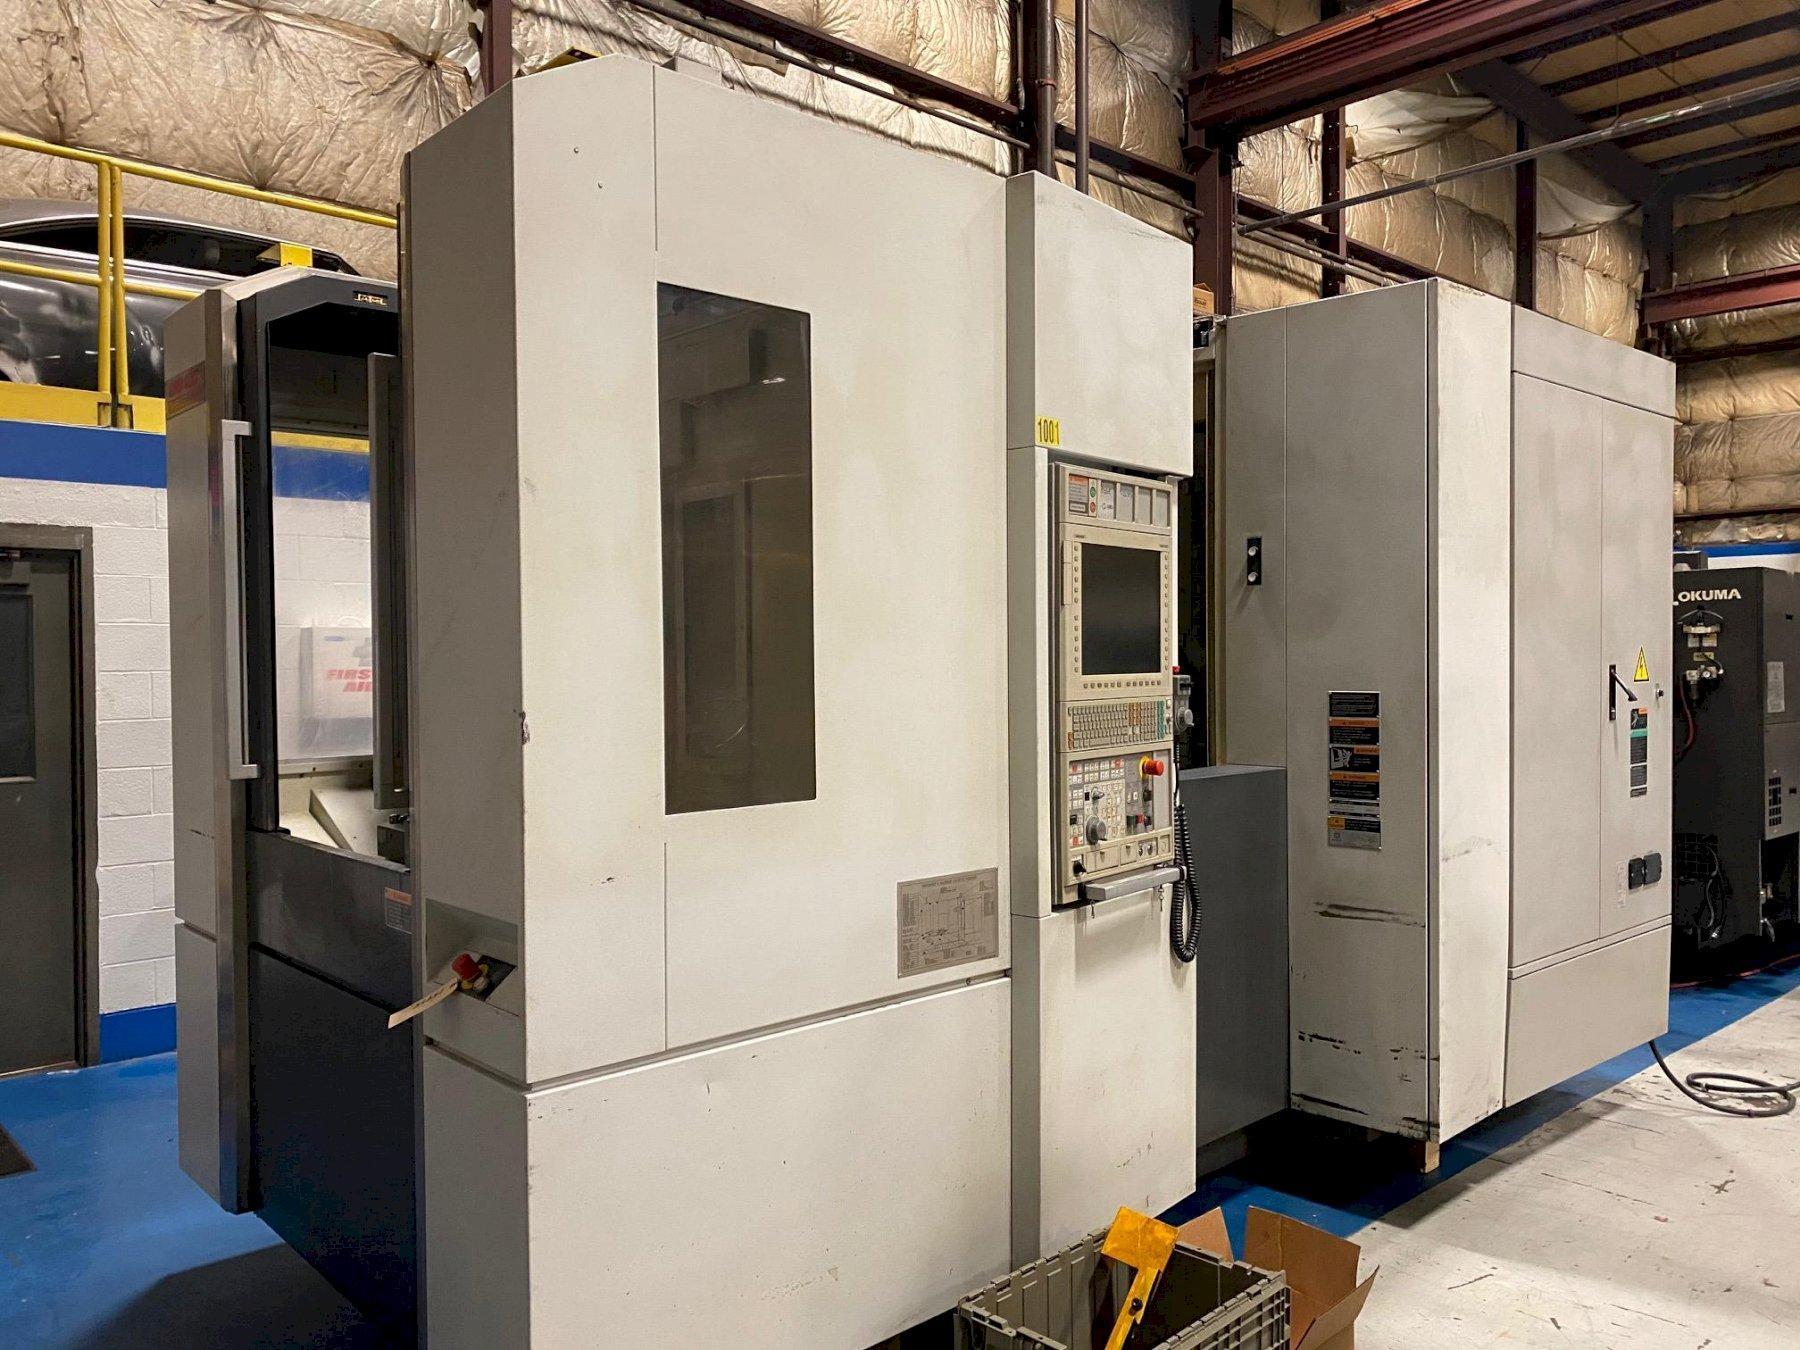 Mori Seiki CNC Horizontal Machining Center